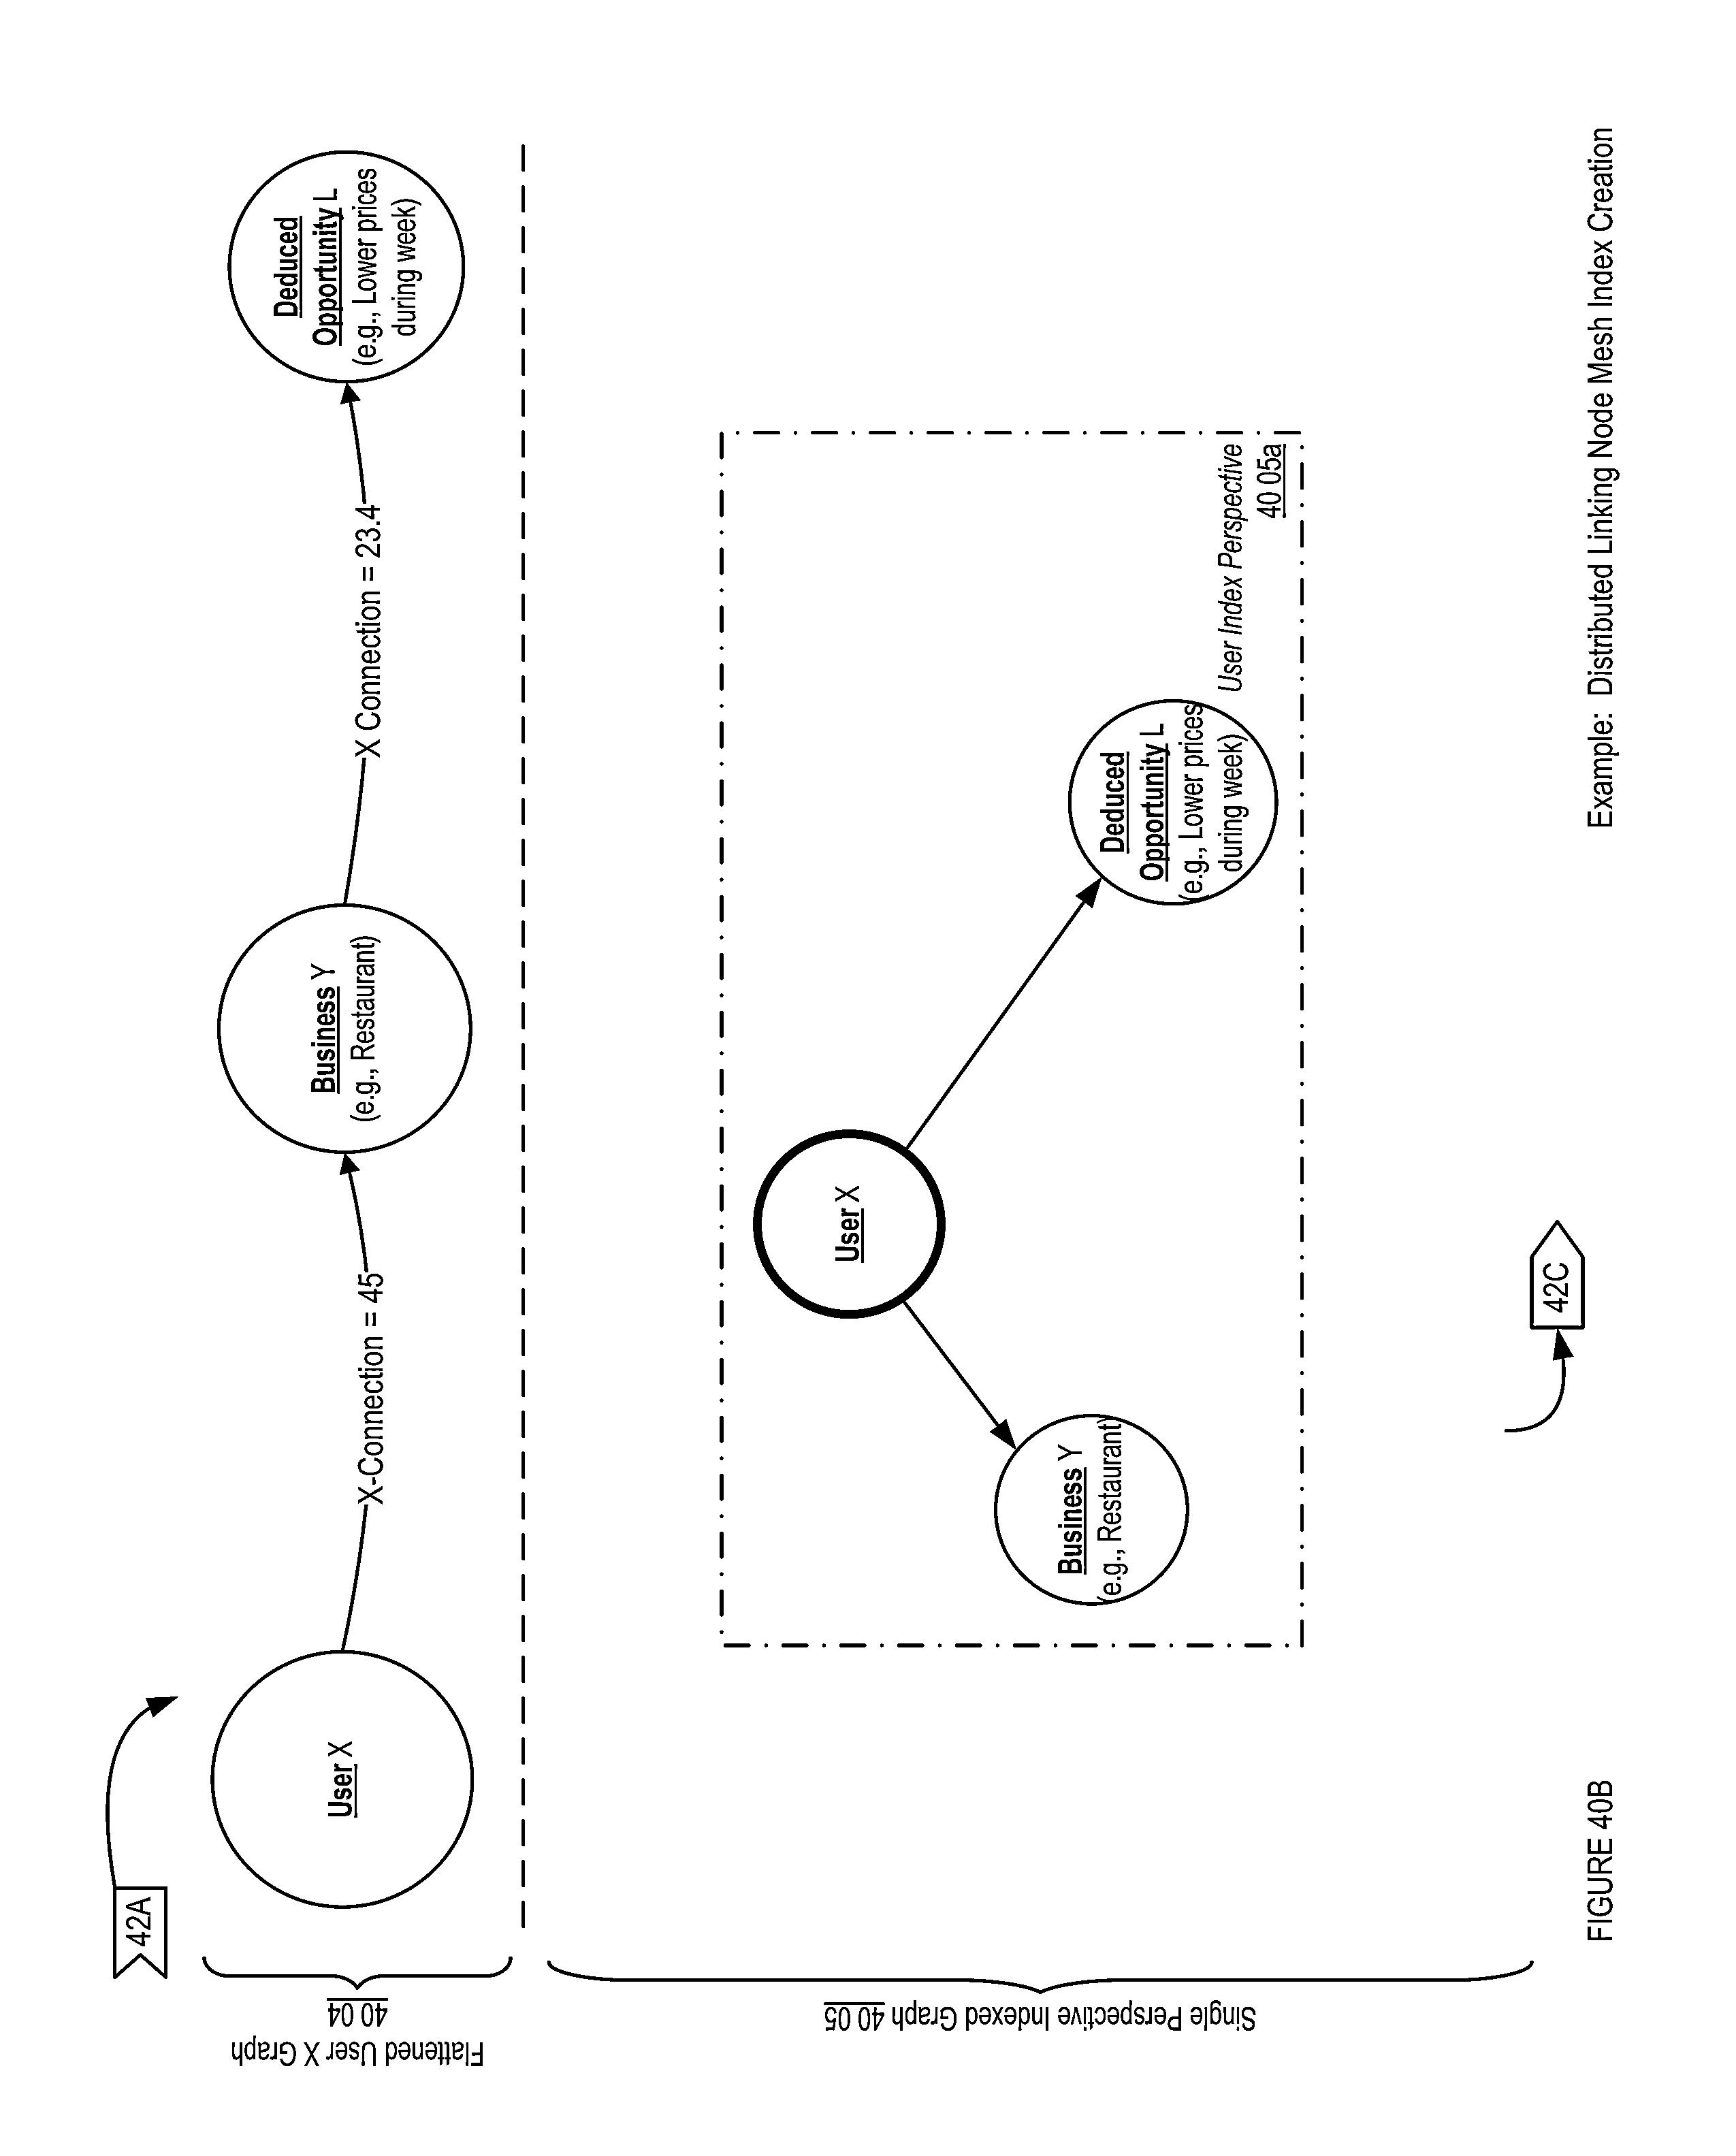 Patent Us 9830328 B2 Toshiba 1600 Xp Wiring Diagram 0 Petitions